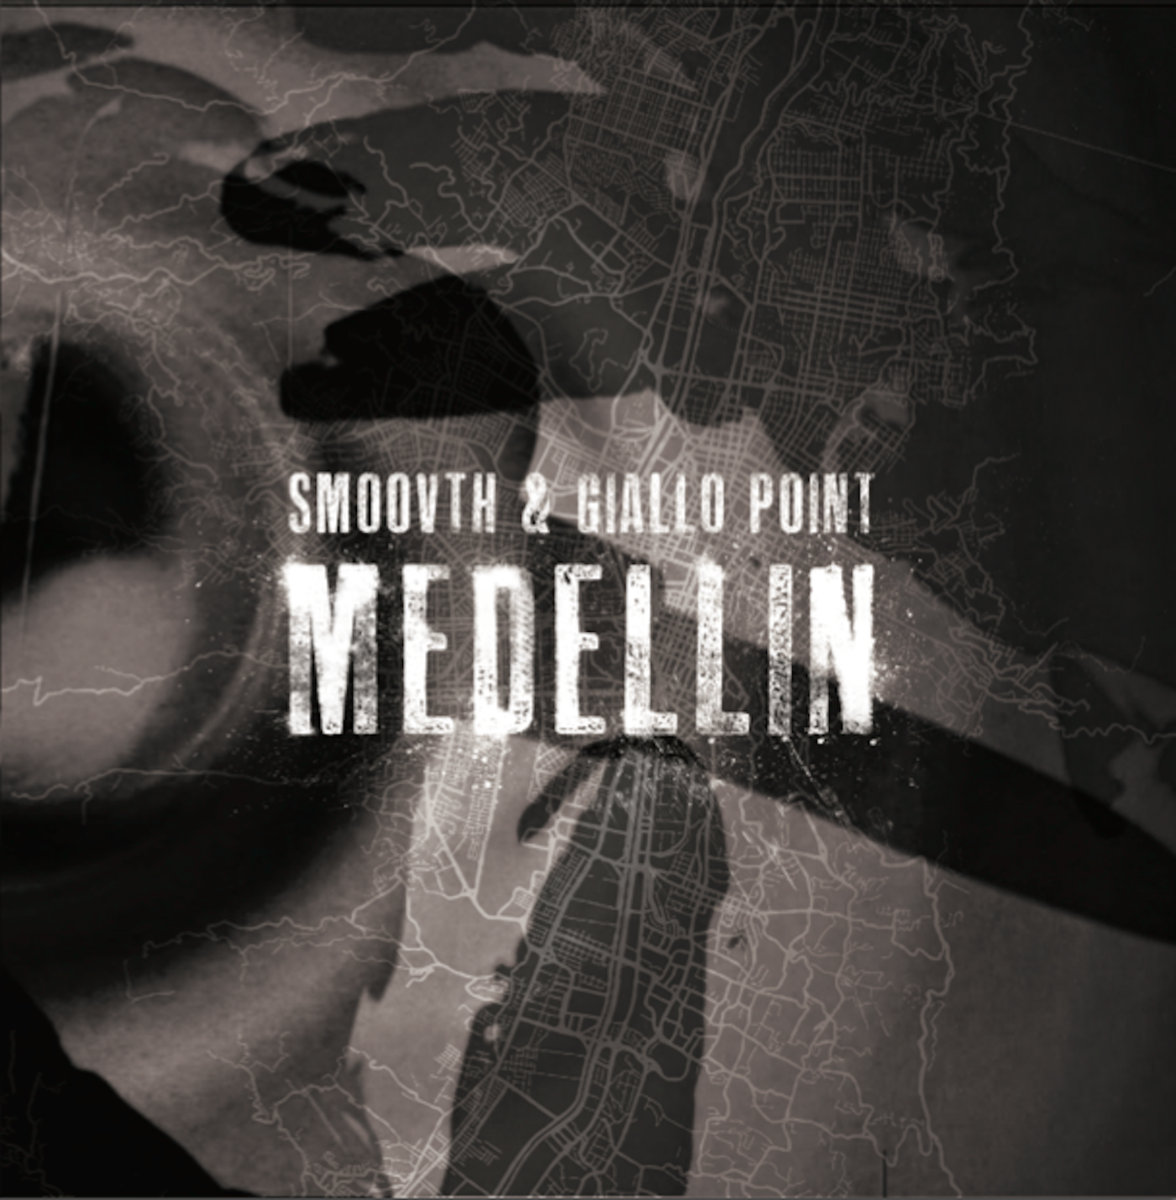 Smoovth___giallo_point_presentan__medellin_